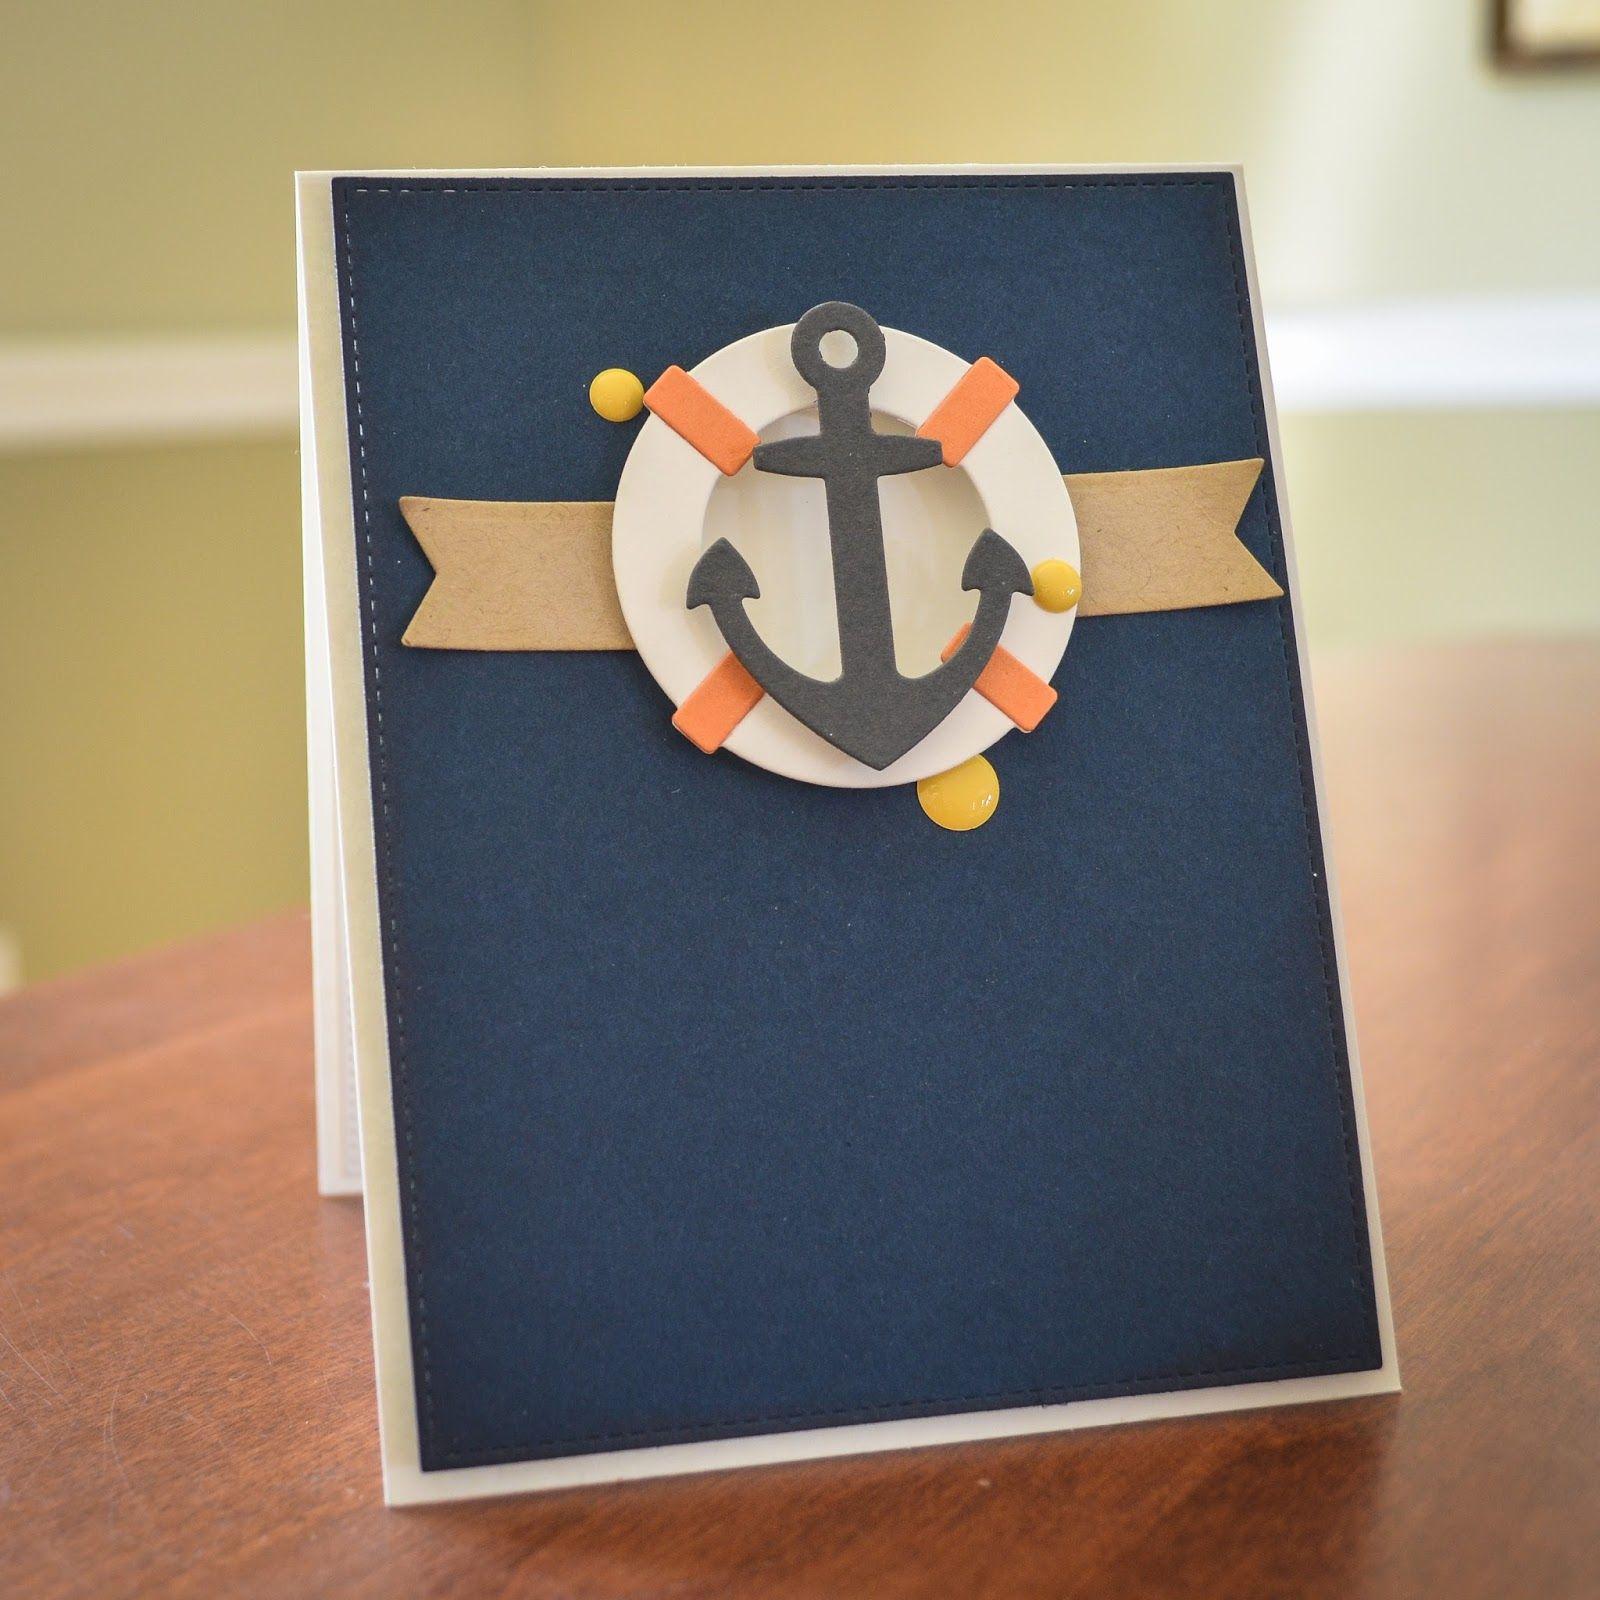 Nautical card MFT anchor & lifesaver- nautisk maritimt kort - marine - anker og redningskrans - Karte maritim  #MFTStamp